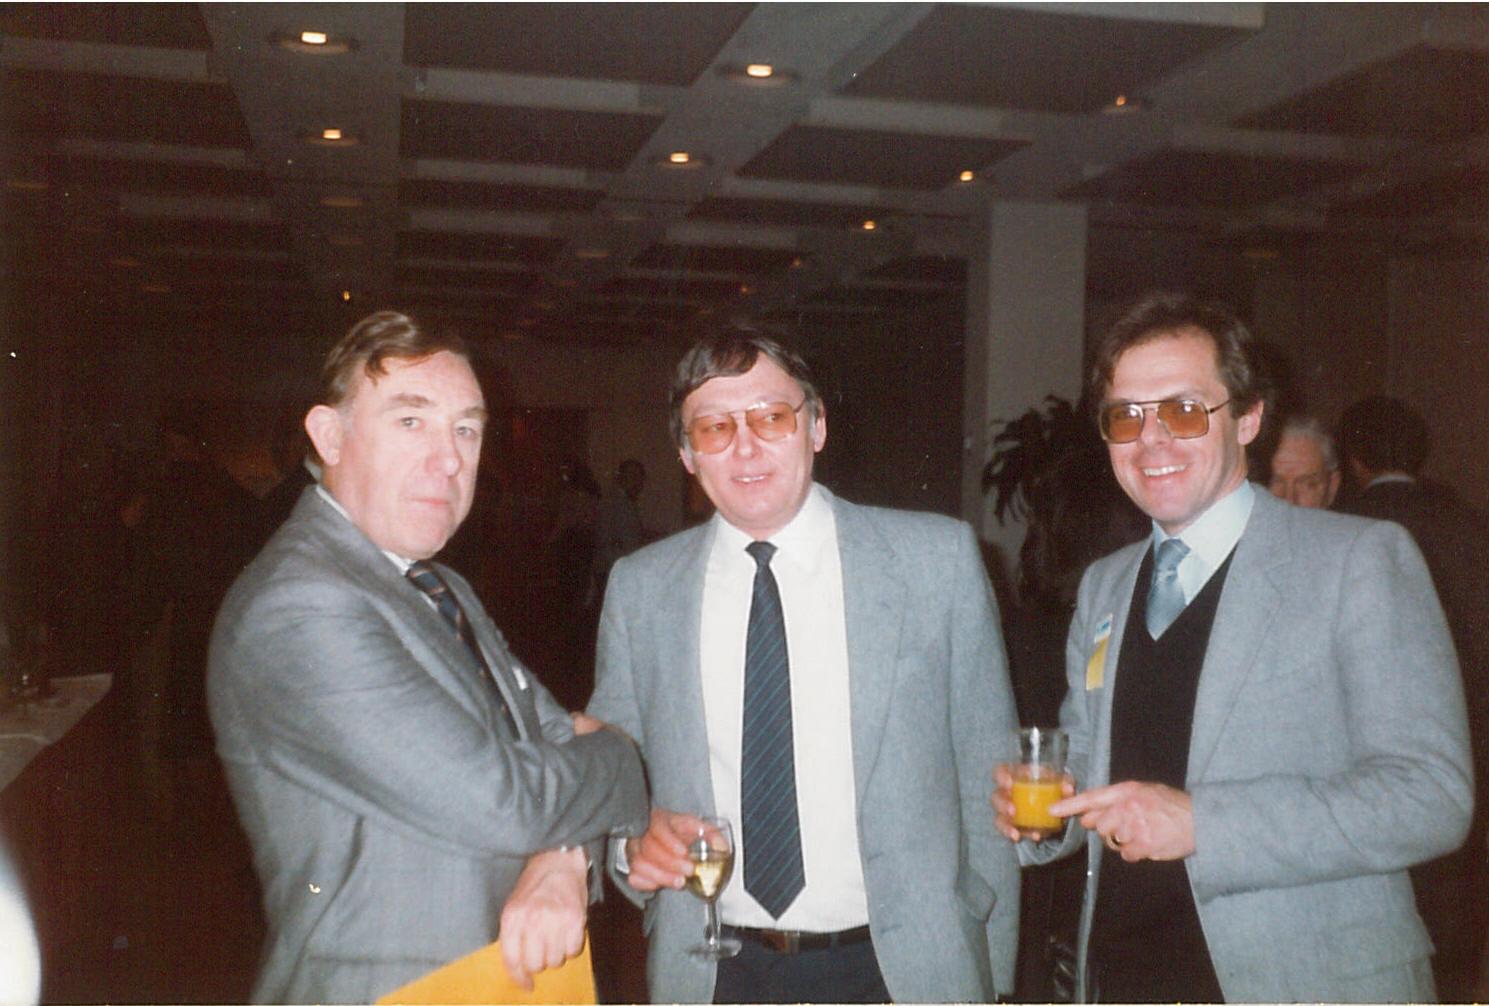 John Rodda, Ken Mays, Cliff Temple